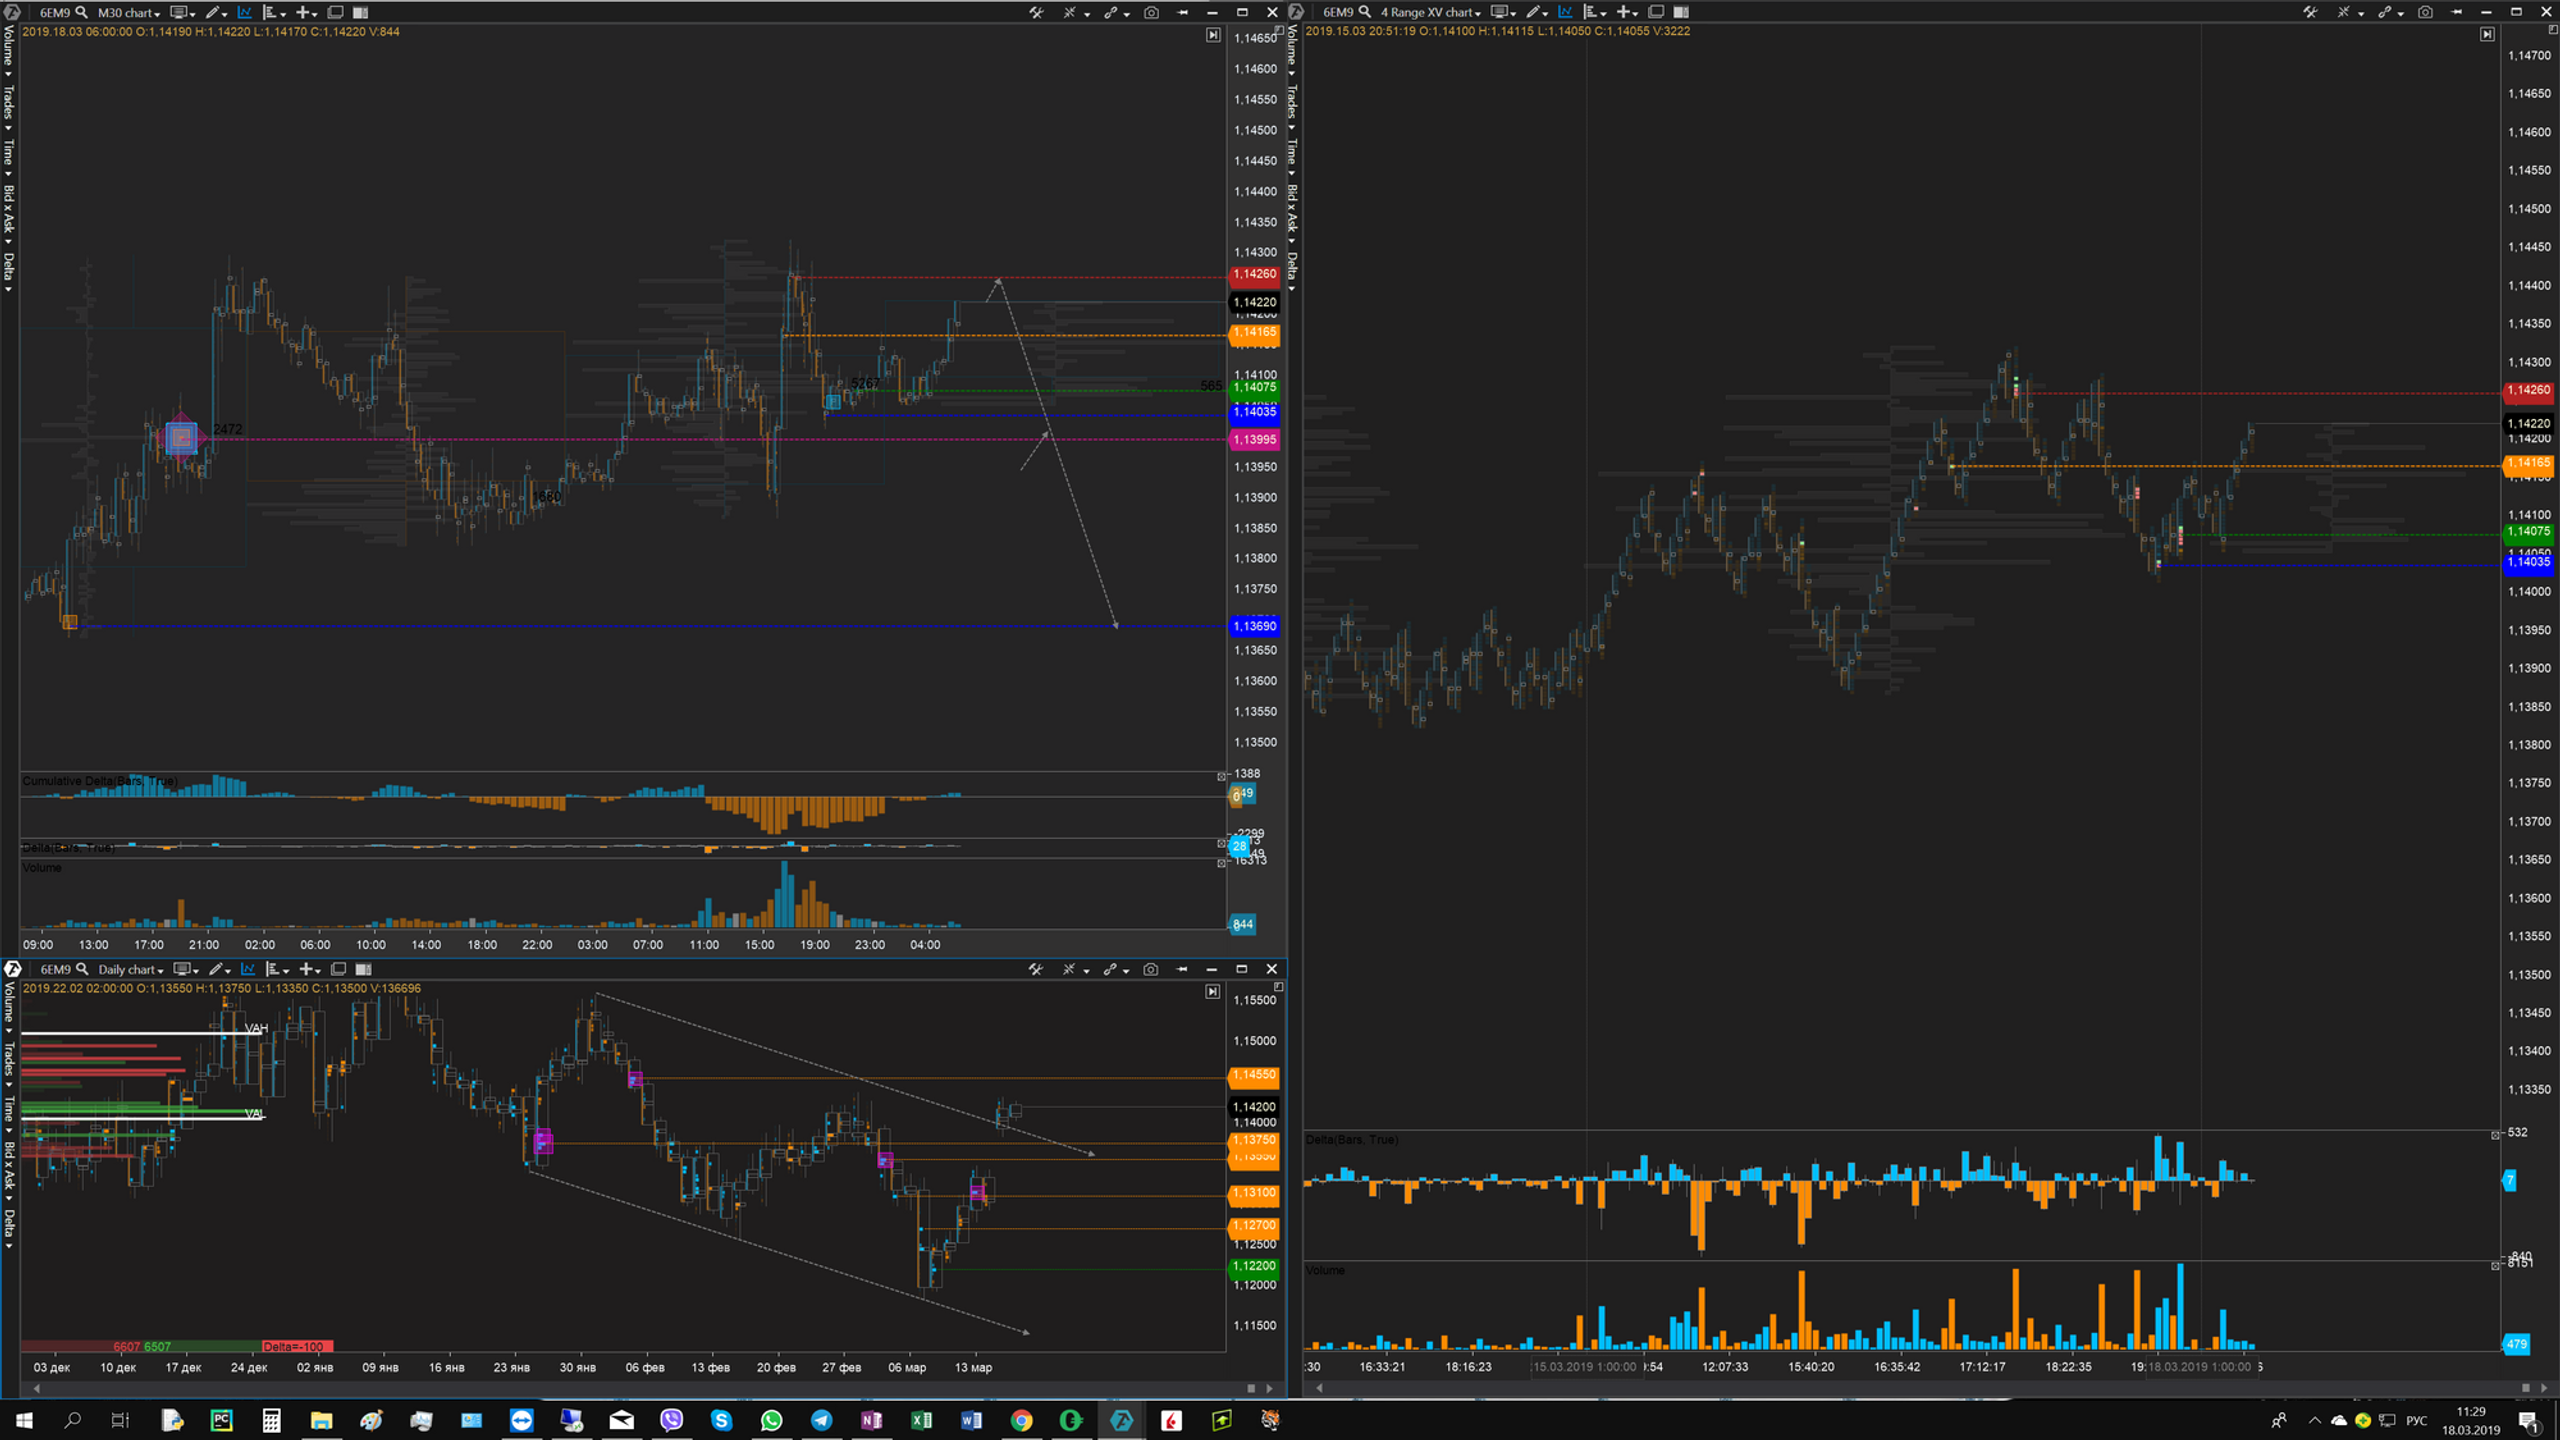 03.18.2019 EURUSD trading plan